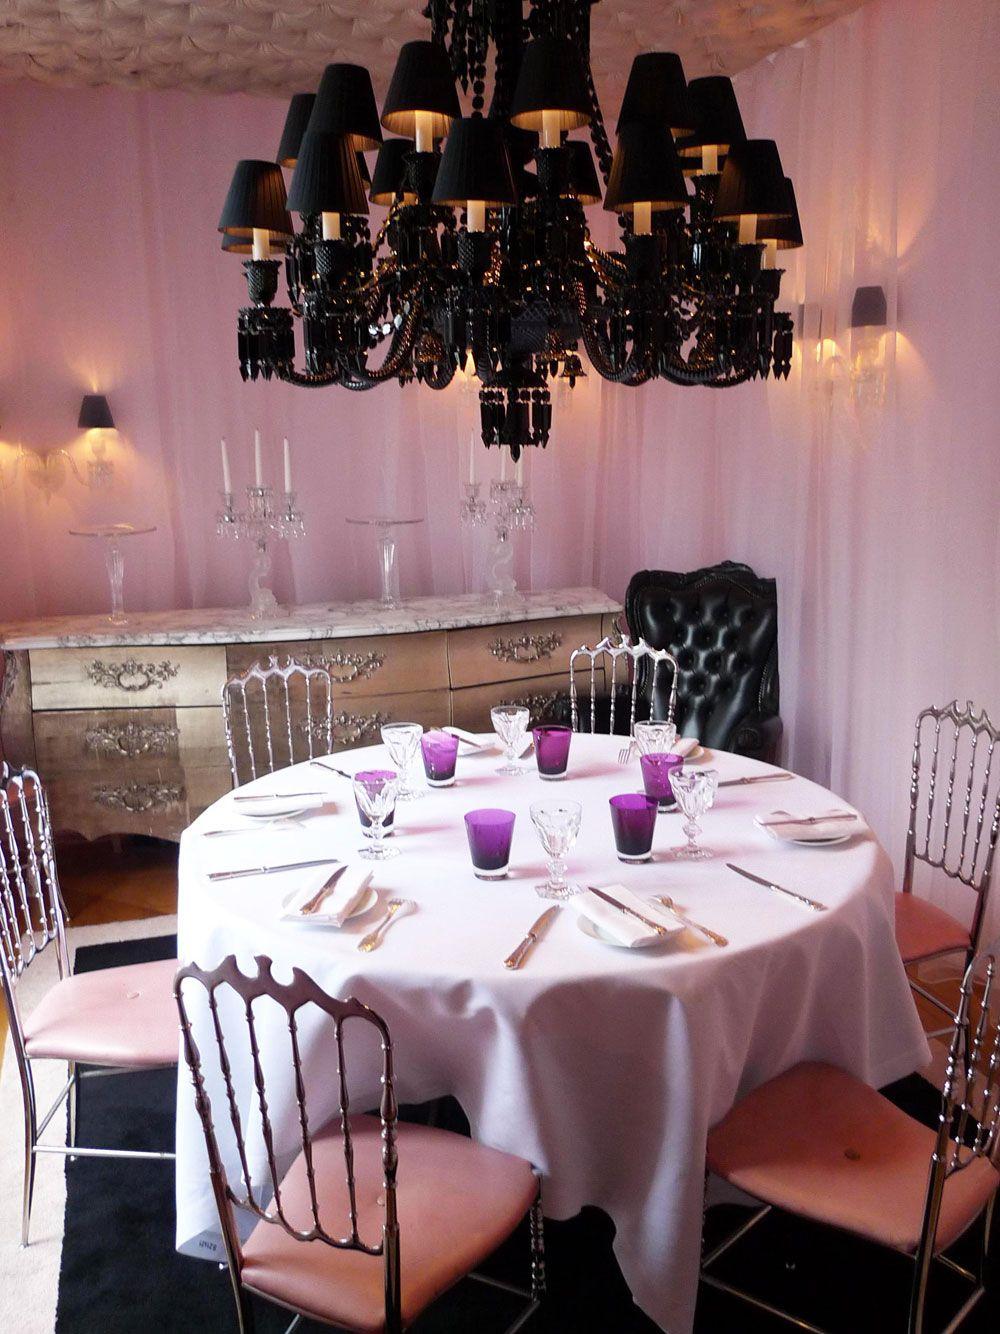 Le Cristal Room Baccarat Pesquisa Do Google Stylish Restaurants Paris Restaurants Crystal Room